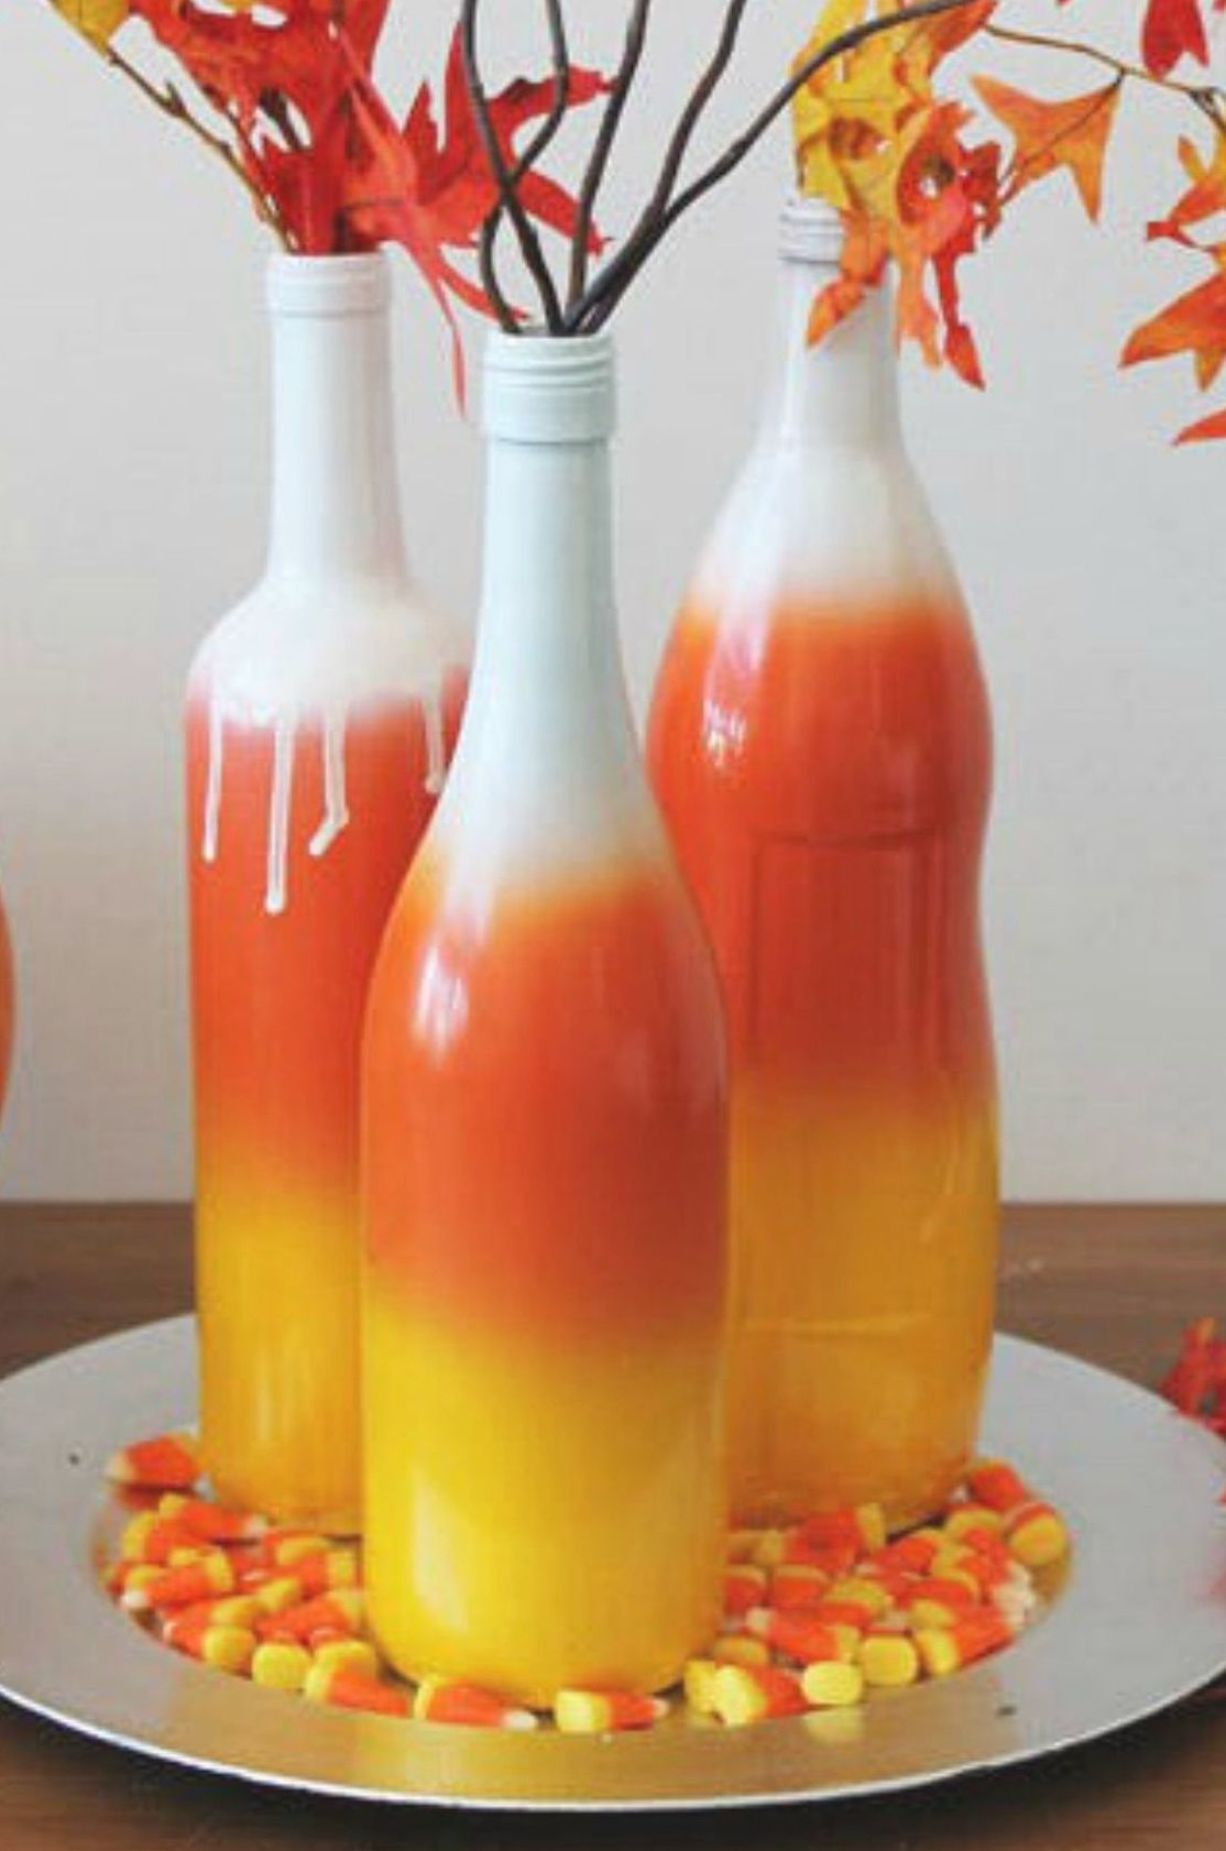 30 Diy Wine Bottle Crafts Empty Wine Bottle Decoration Ideas In 2020 Empty Wine Bottles Wine Bottle Diy Wine Bottle Diy Crafts